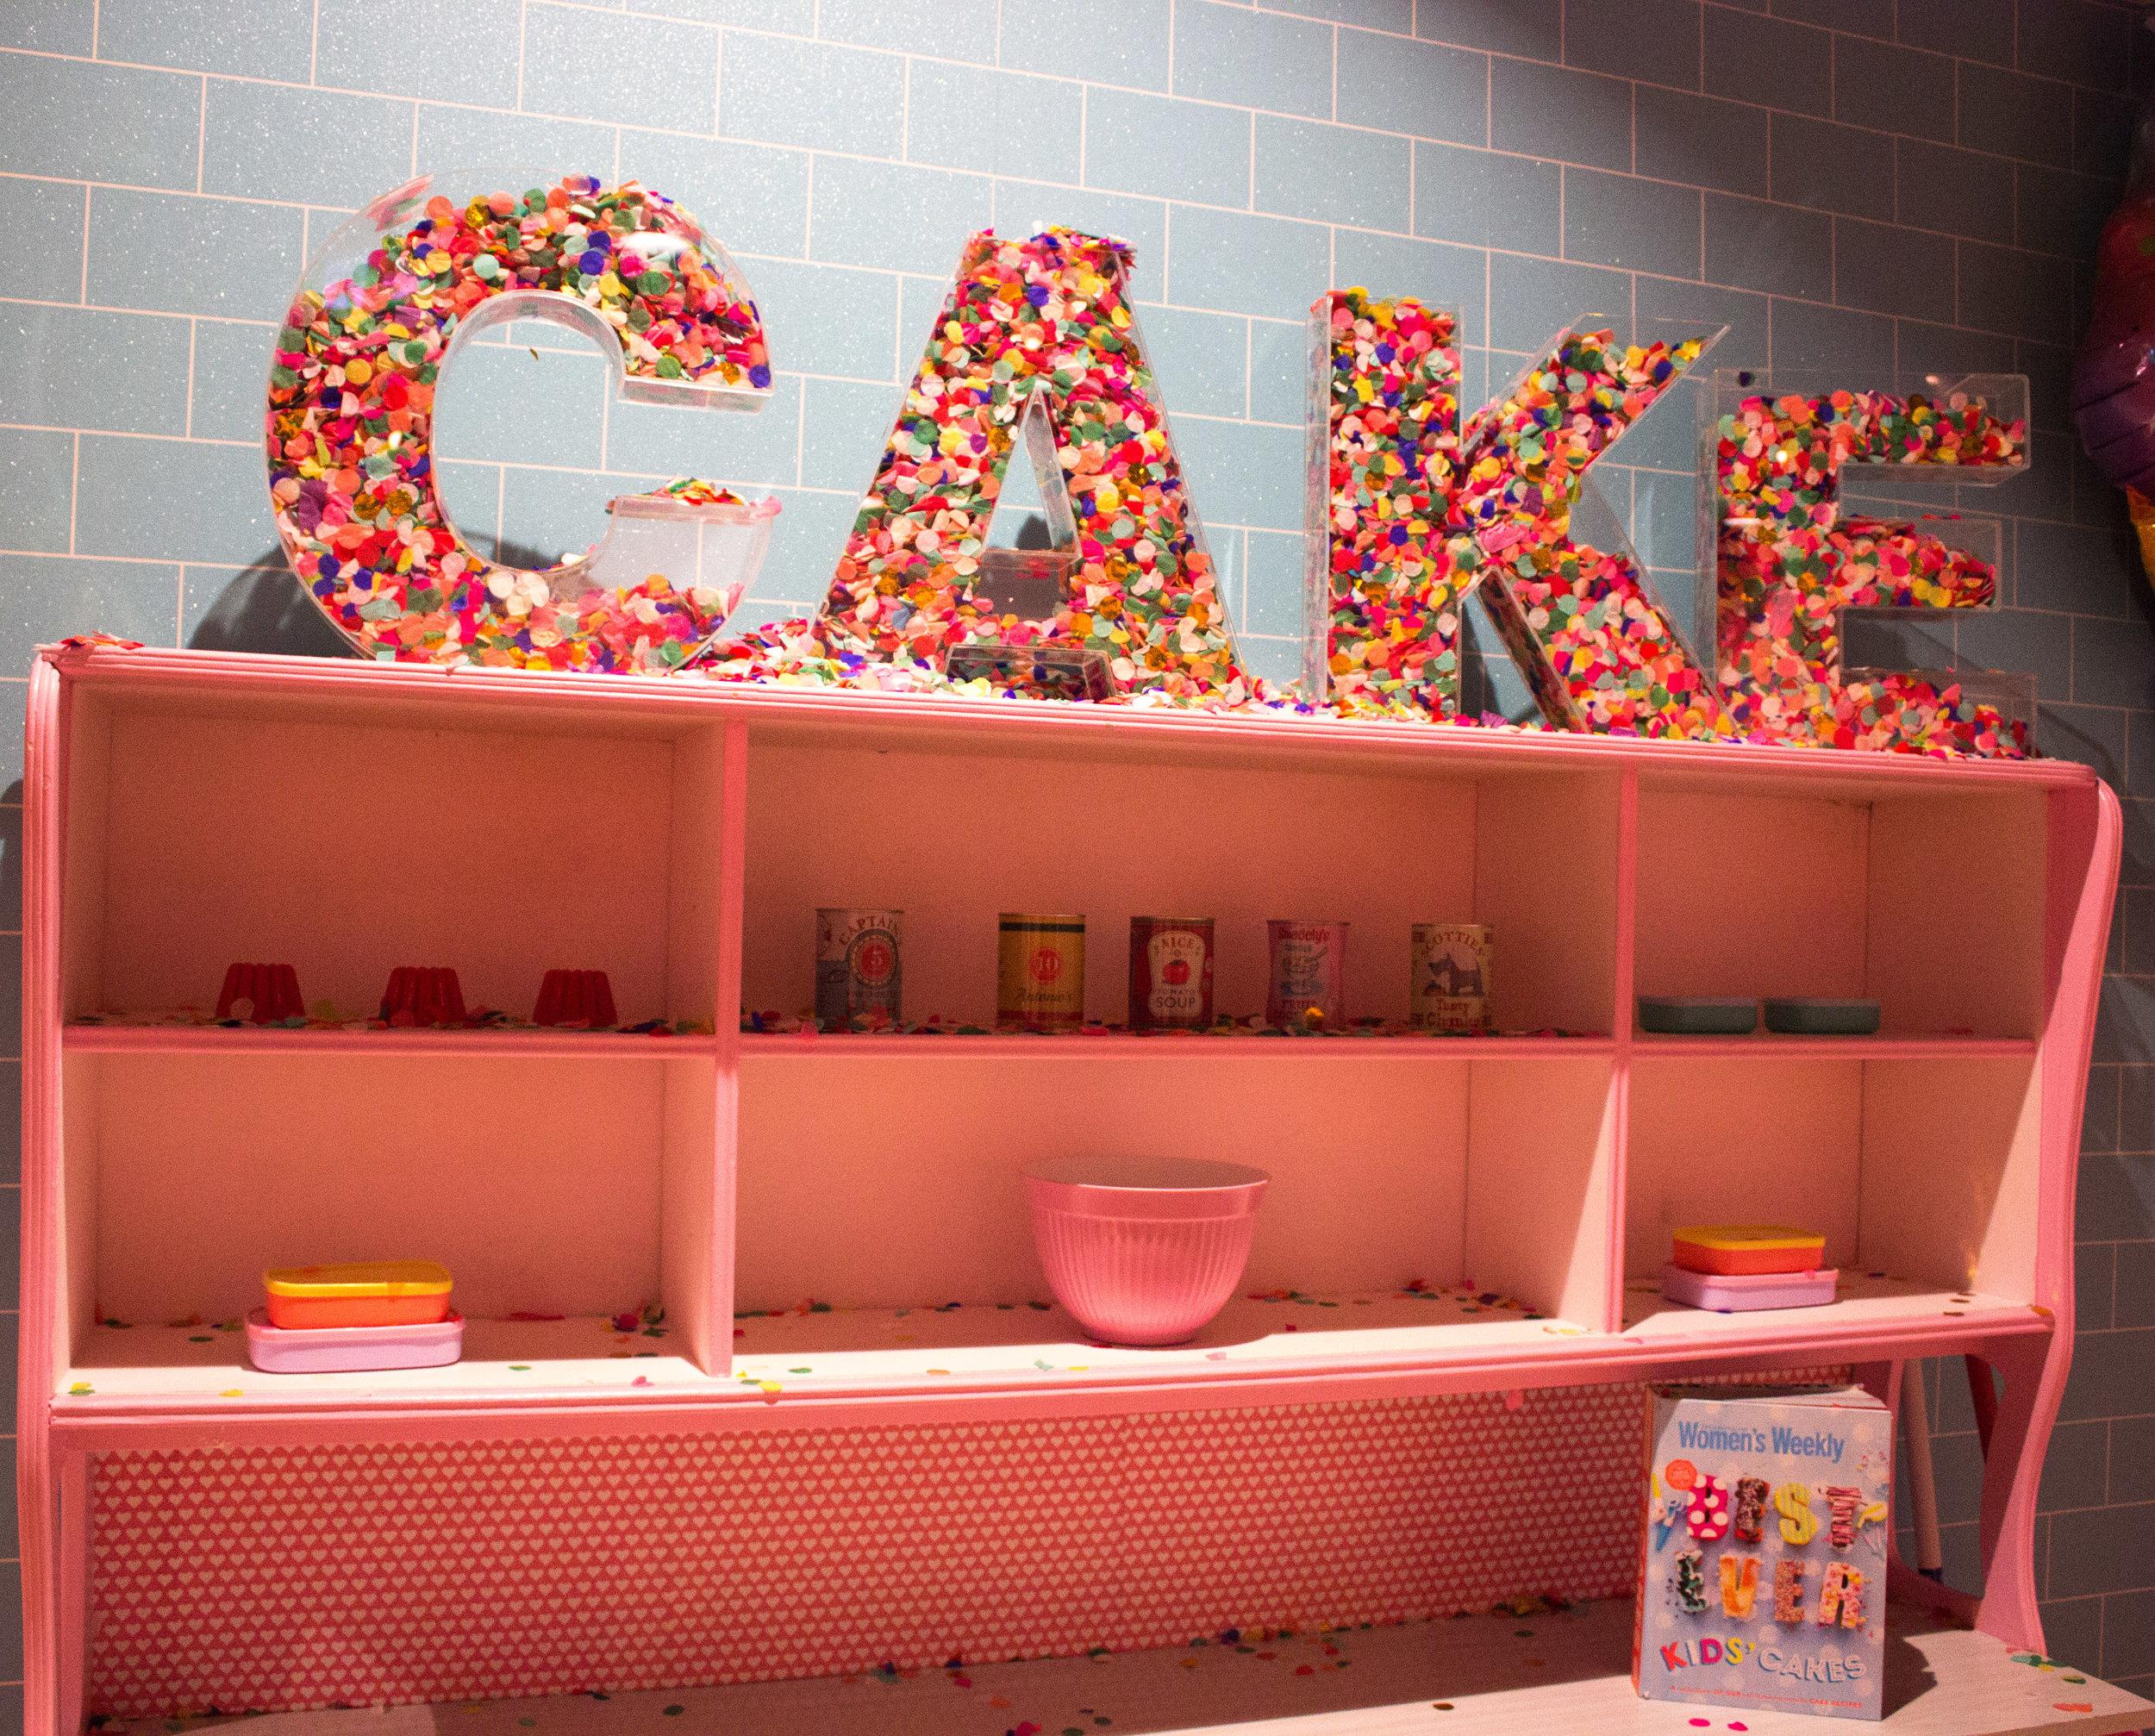 sugarmuseum-29.jpg